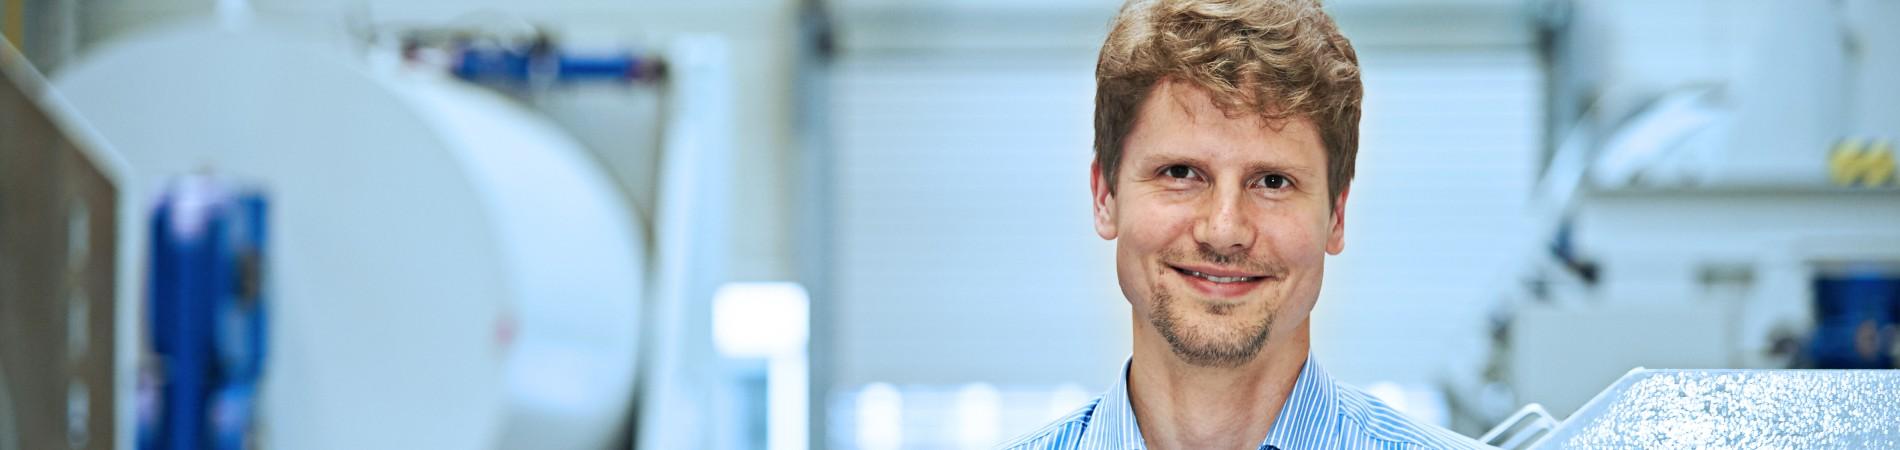 thyssenkrupp Bearings employee experience report Tobias Ninnemann